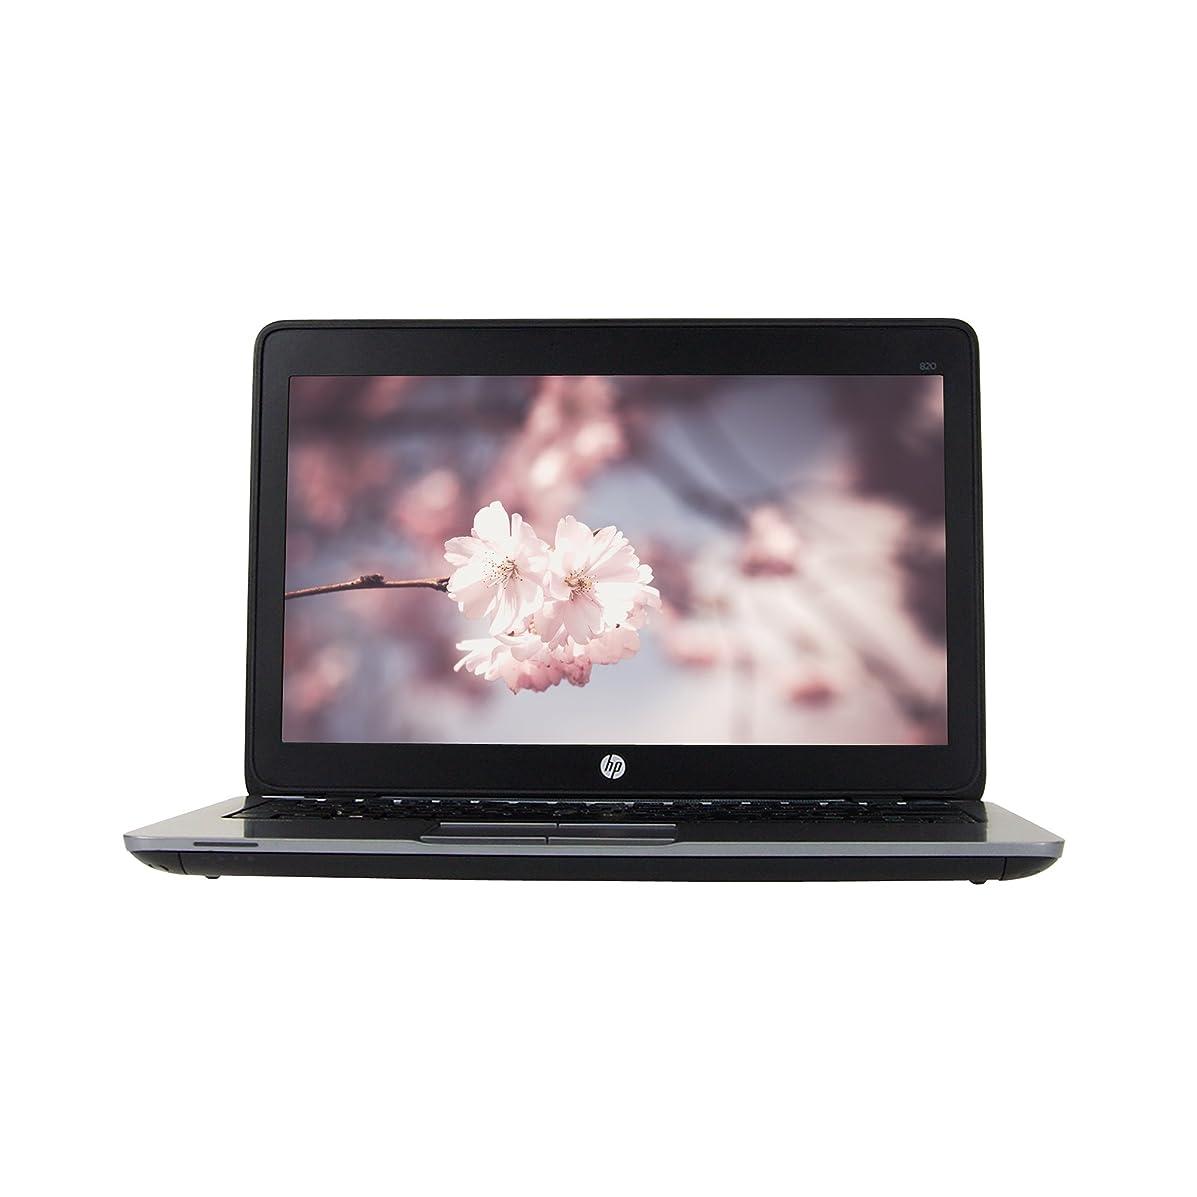 HP Elitebook 820 G2 12.5in Laptop, Core i5-5300U 2.3GHz, 8GB Ram, 120GB SSD, Windows 10 Pro 64bit (Renewed)